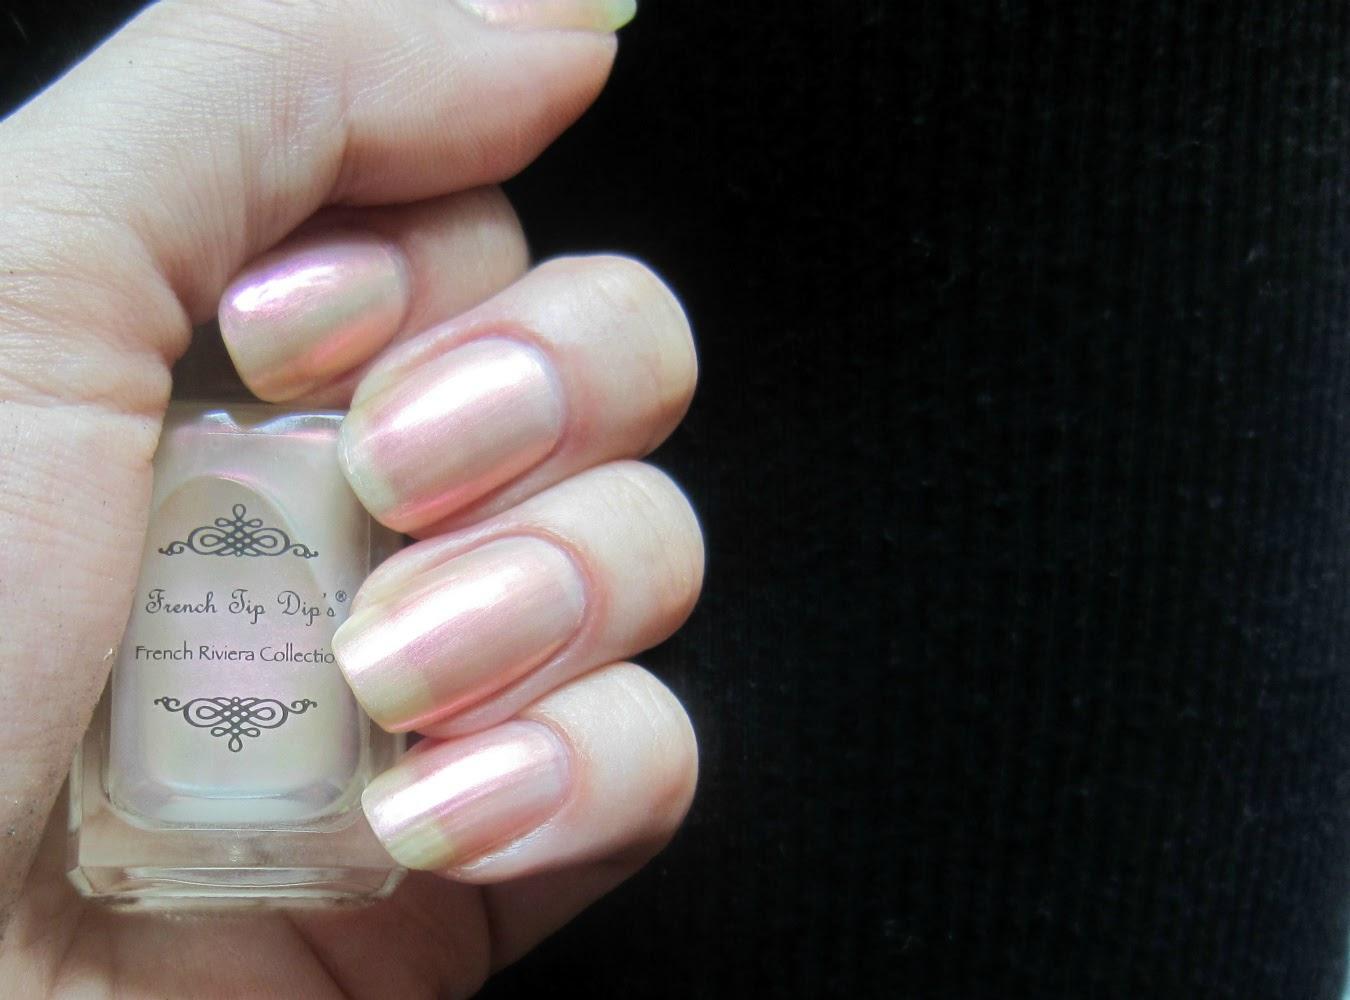 Concrete and Nail Polish: Sheer